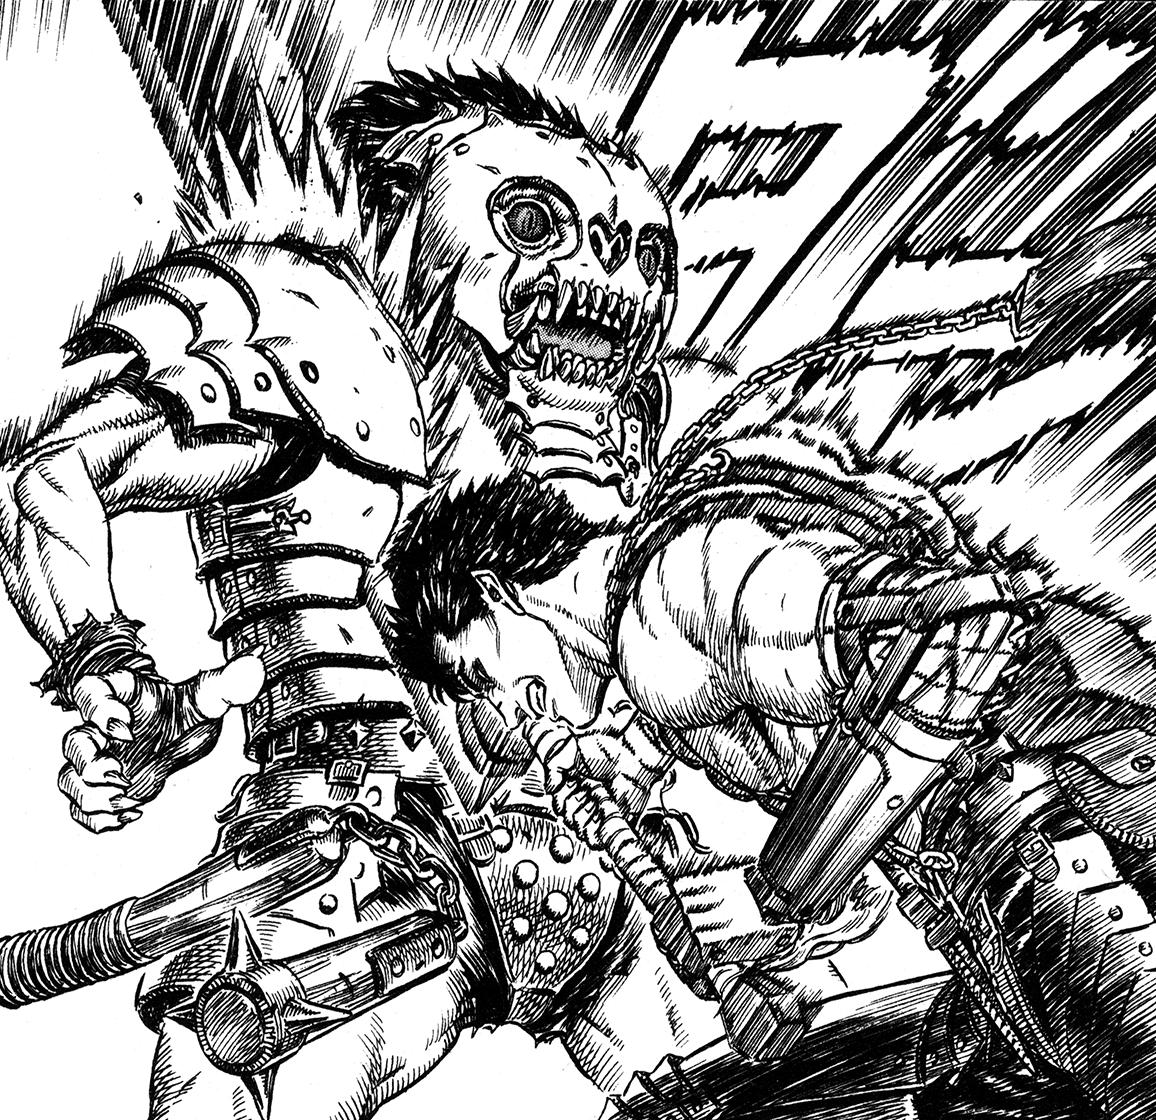 1156x1120 Episode 223 (Manga) Berserk Wiki Fandom Powered By Wikia